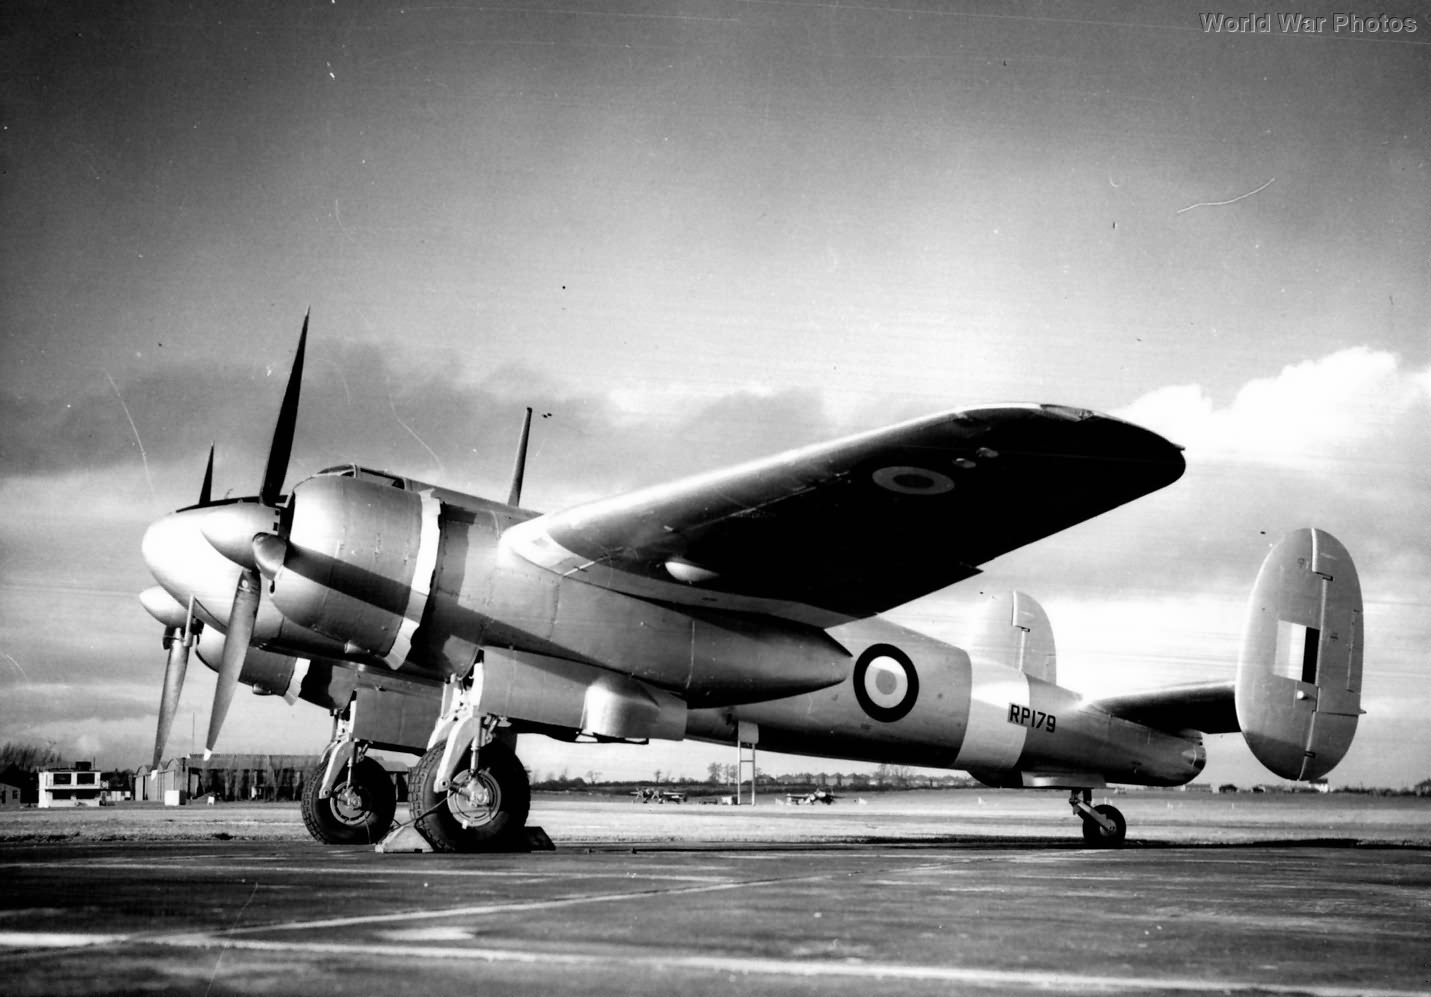 Buckmaster T Mk 1 RP179